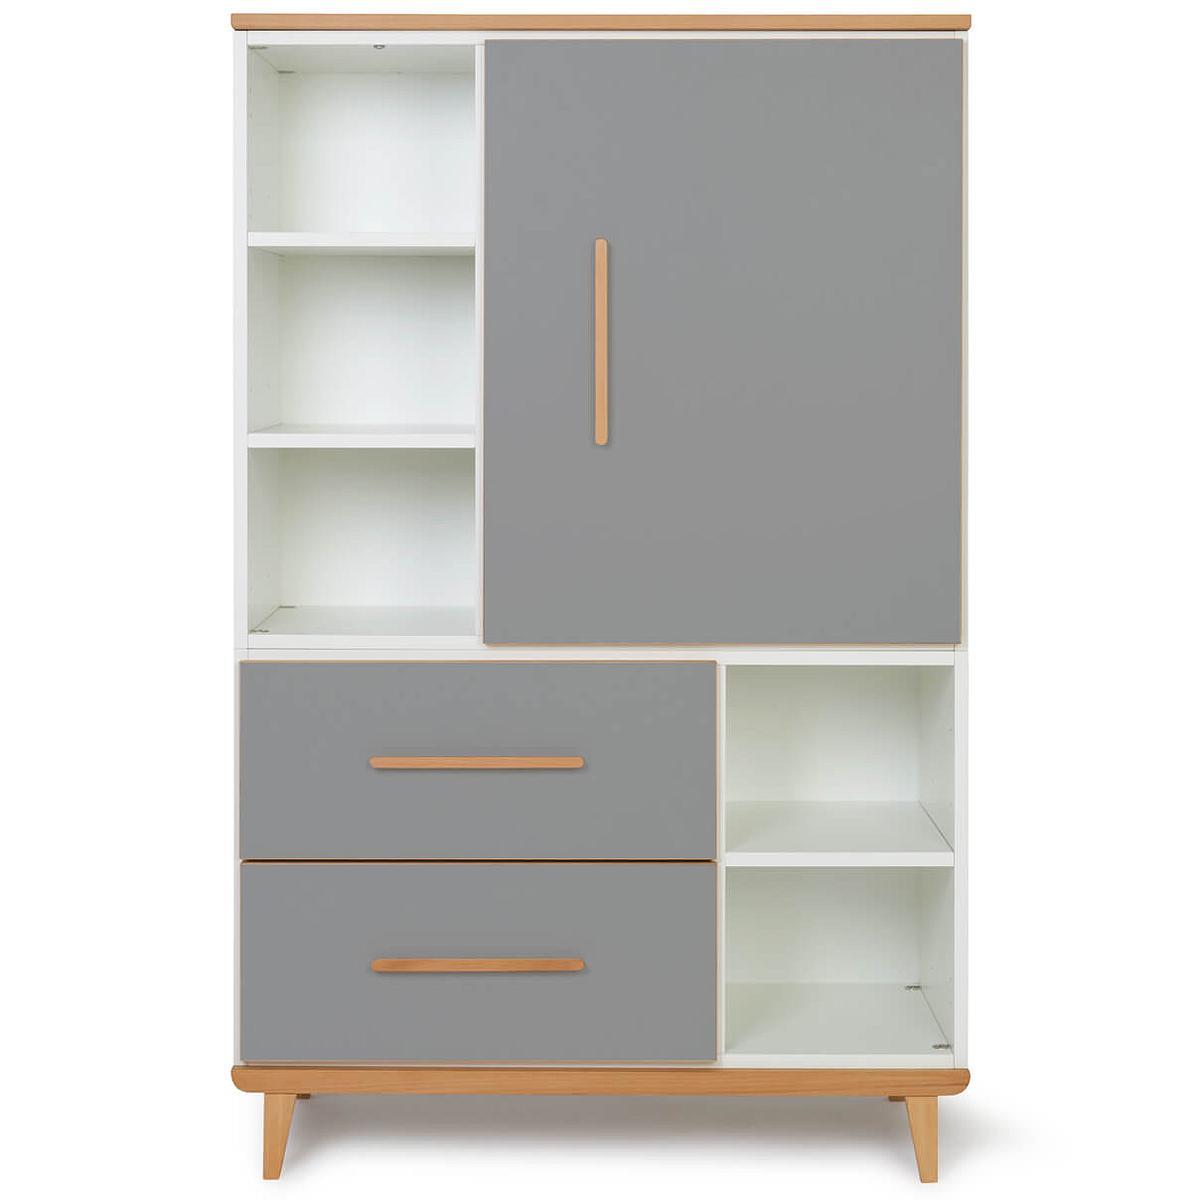 Wookids - Armoire 147cm 1 porte 2 tiroirs NADO slate grey